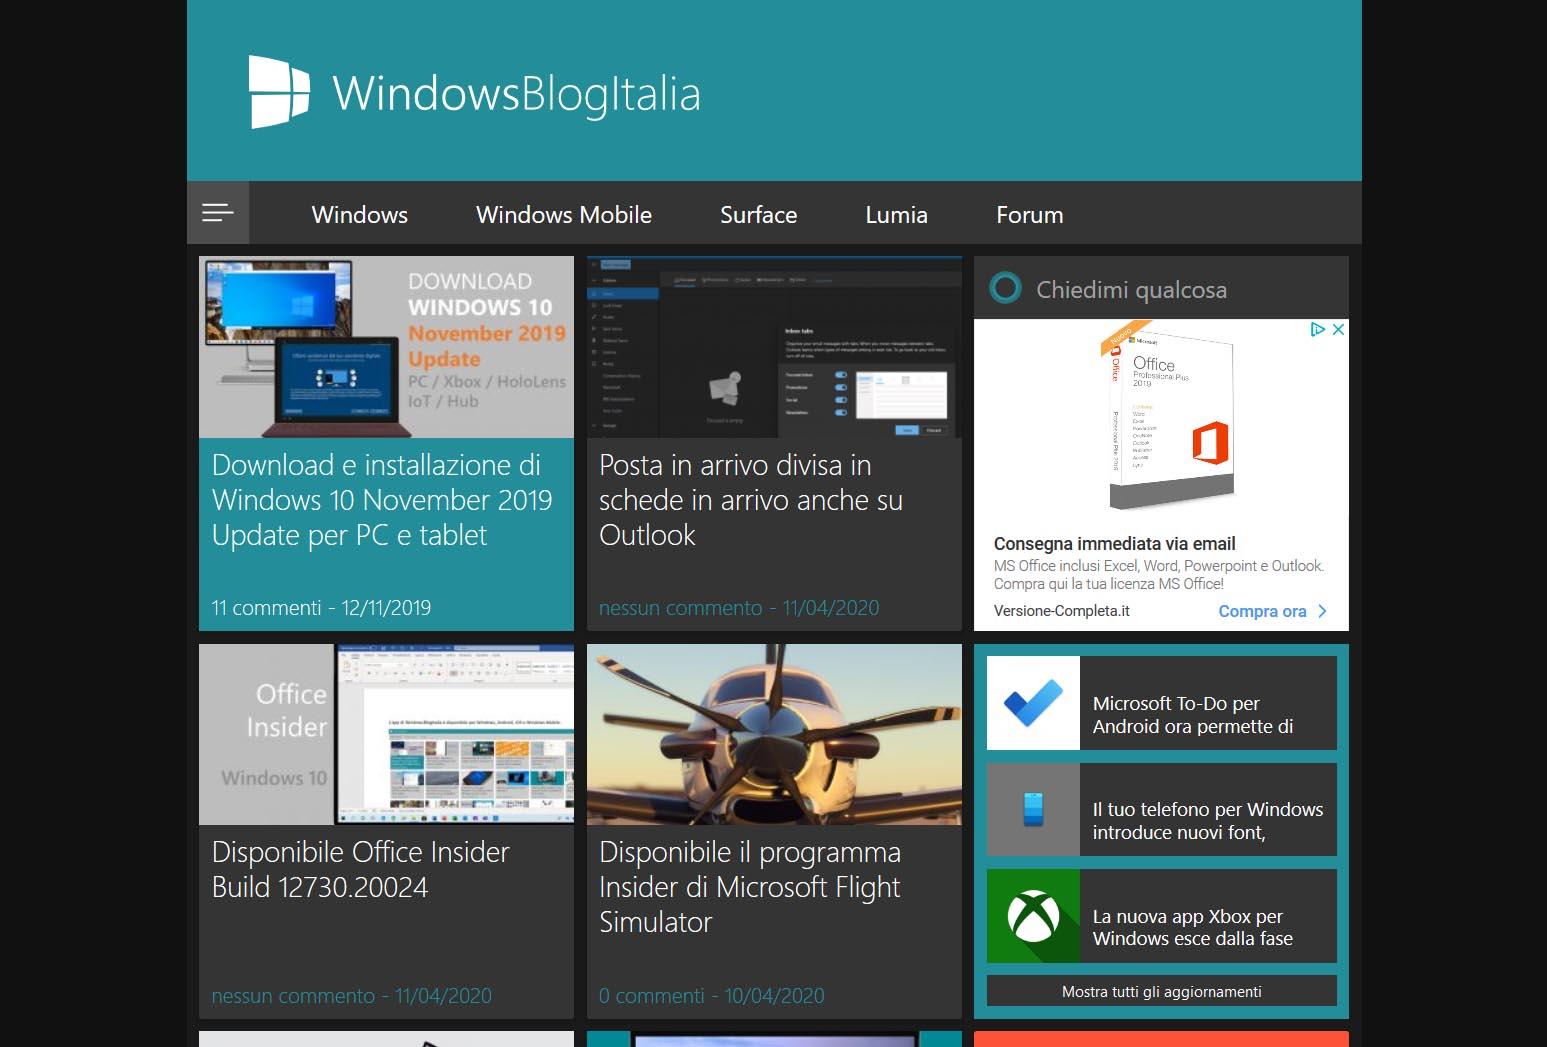 WindowsBlogItalia tema scuro